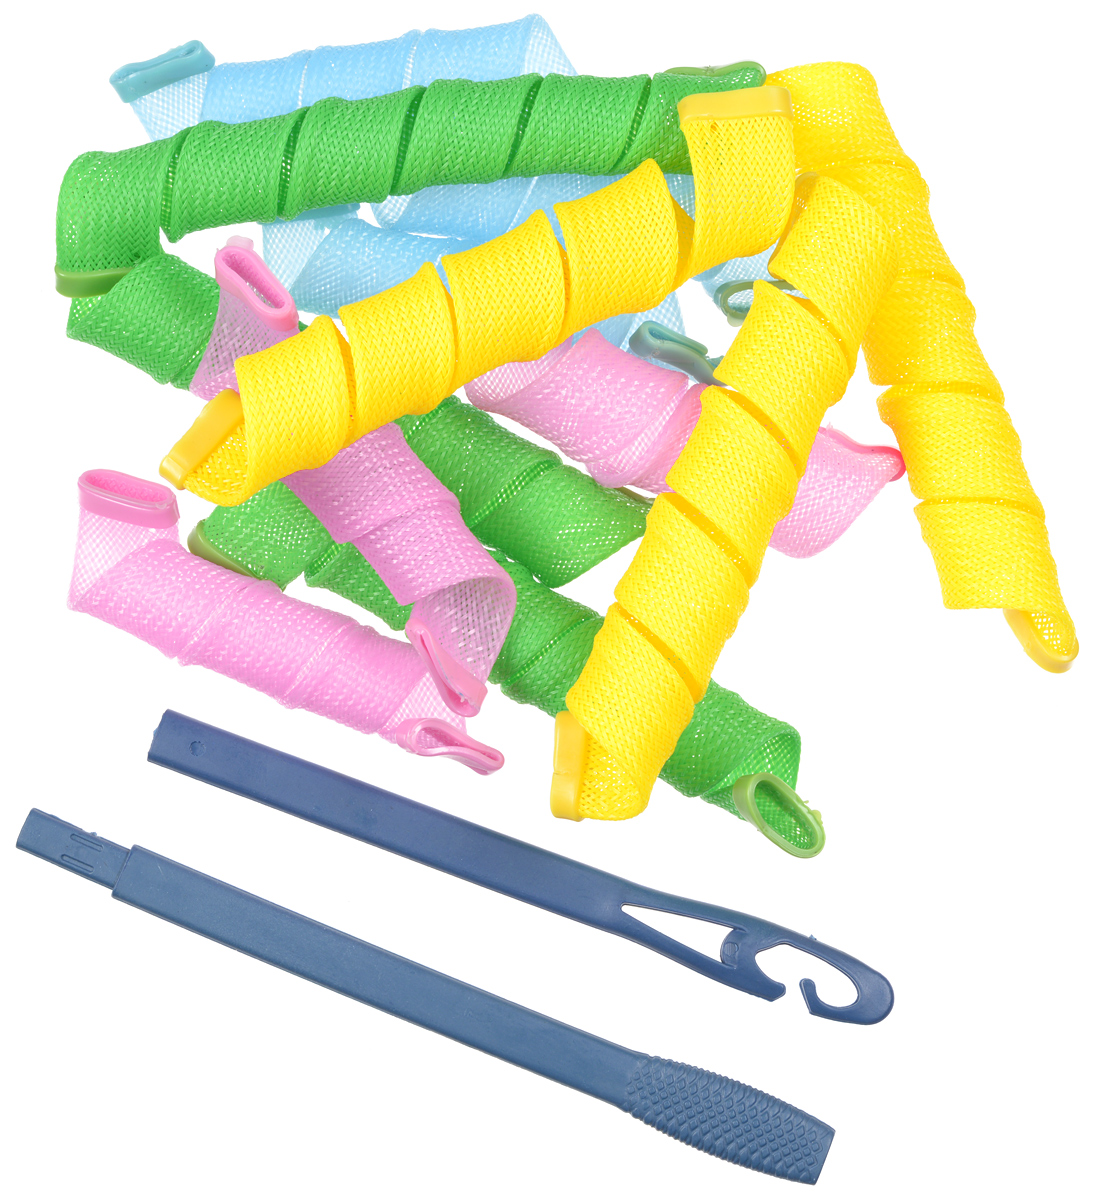 Magic Leverag Бигуди широкие, 6 х 29 см, 6 х 44 см magic leverage крючок тройной для бигуди 56 см